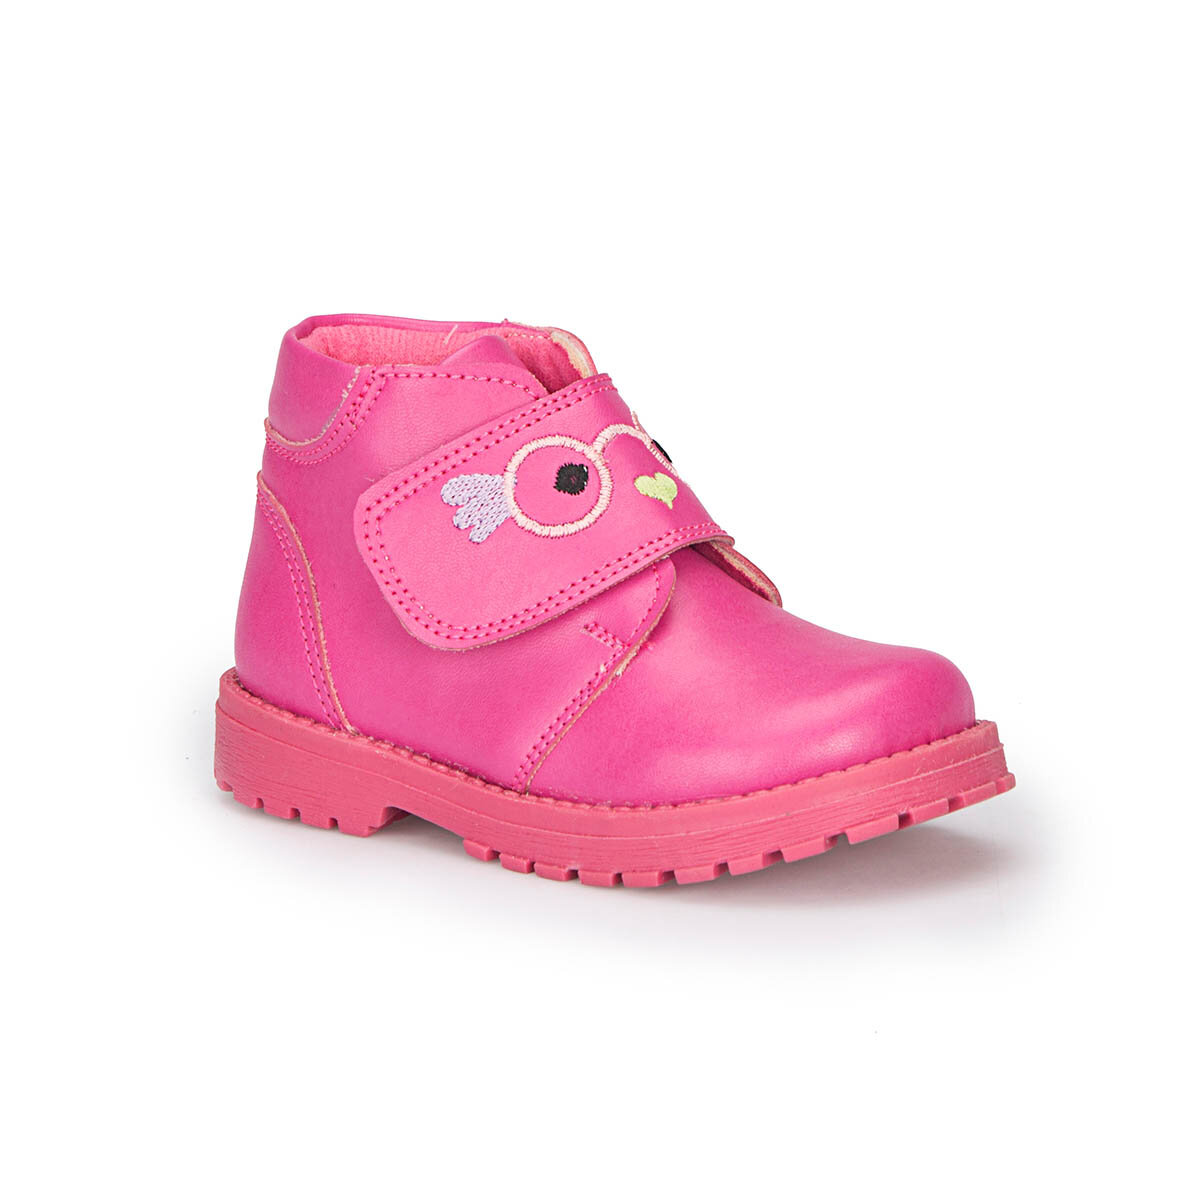 FLO 72. 509524.B Fuchsia Girls Children Boots Polaris